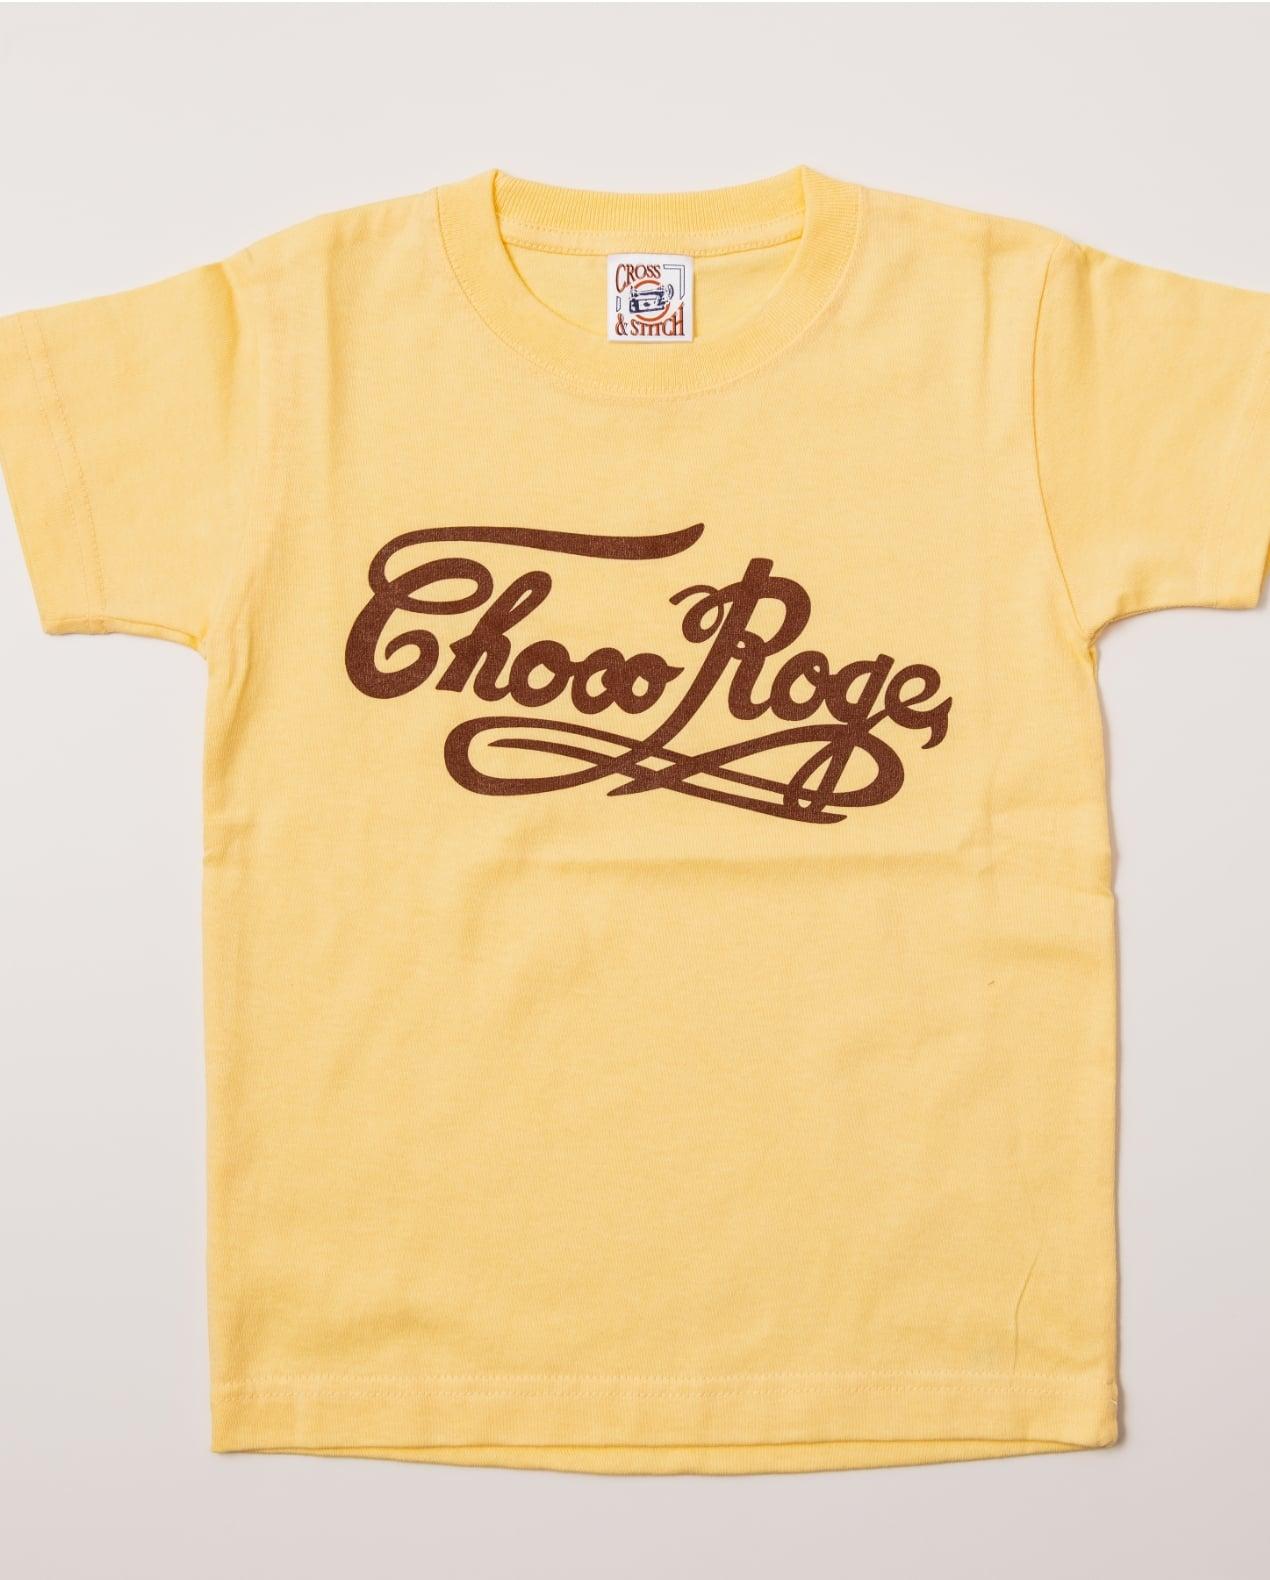 Tシャツ 子供用 黄色 サイズ140